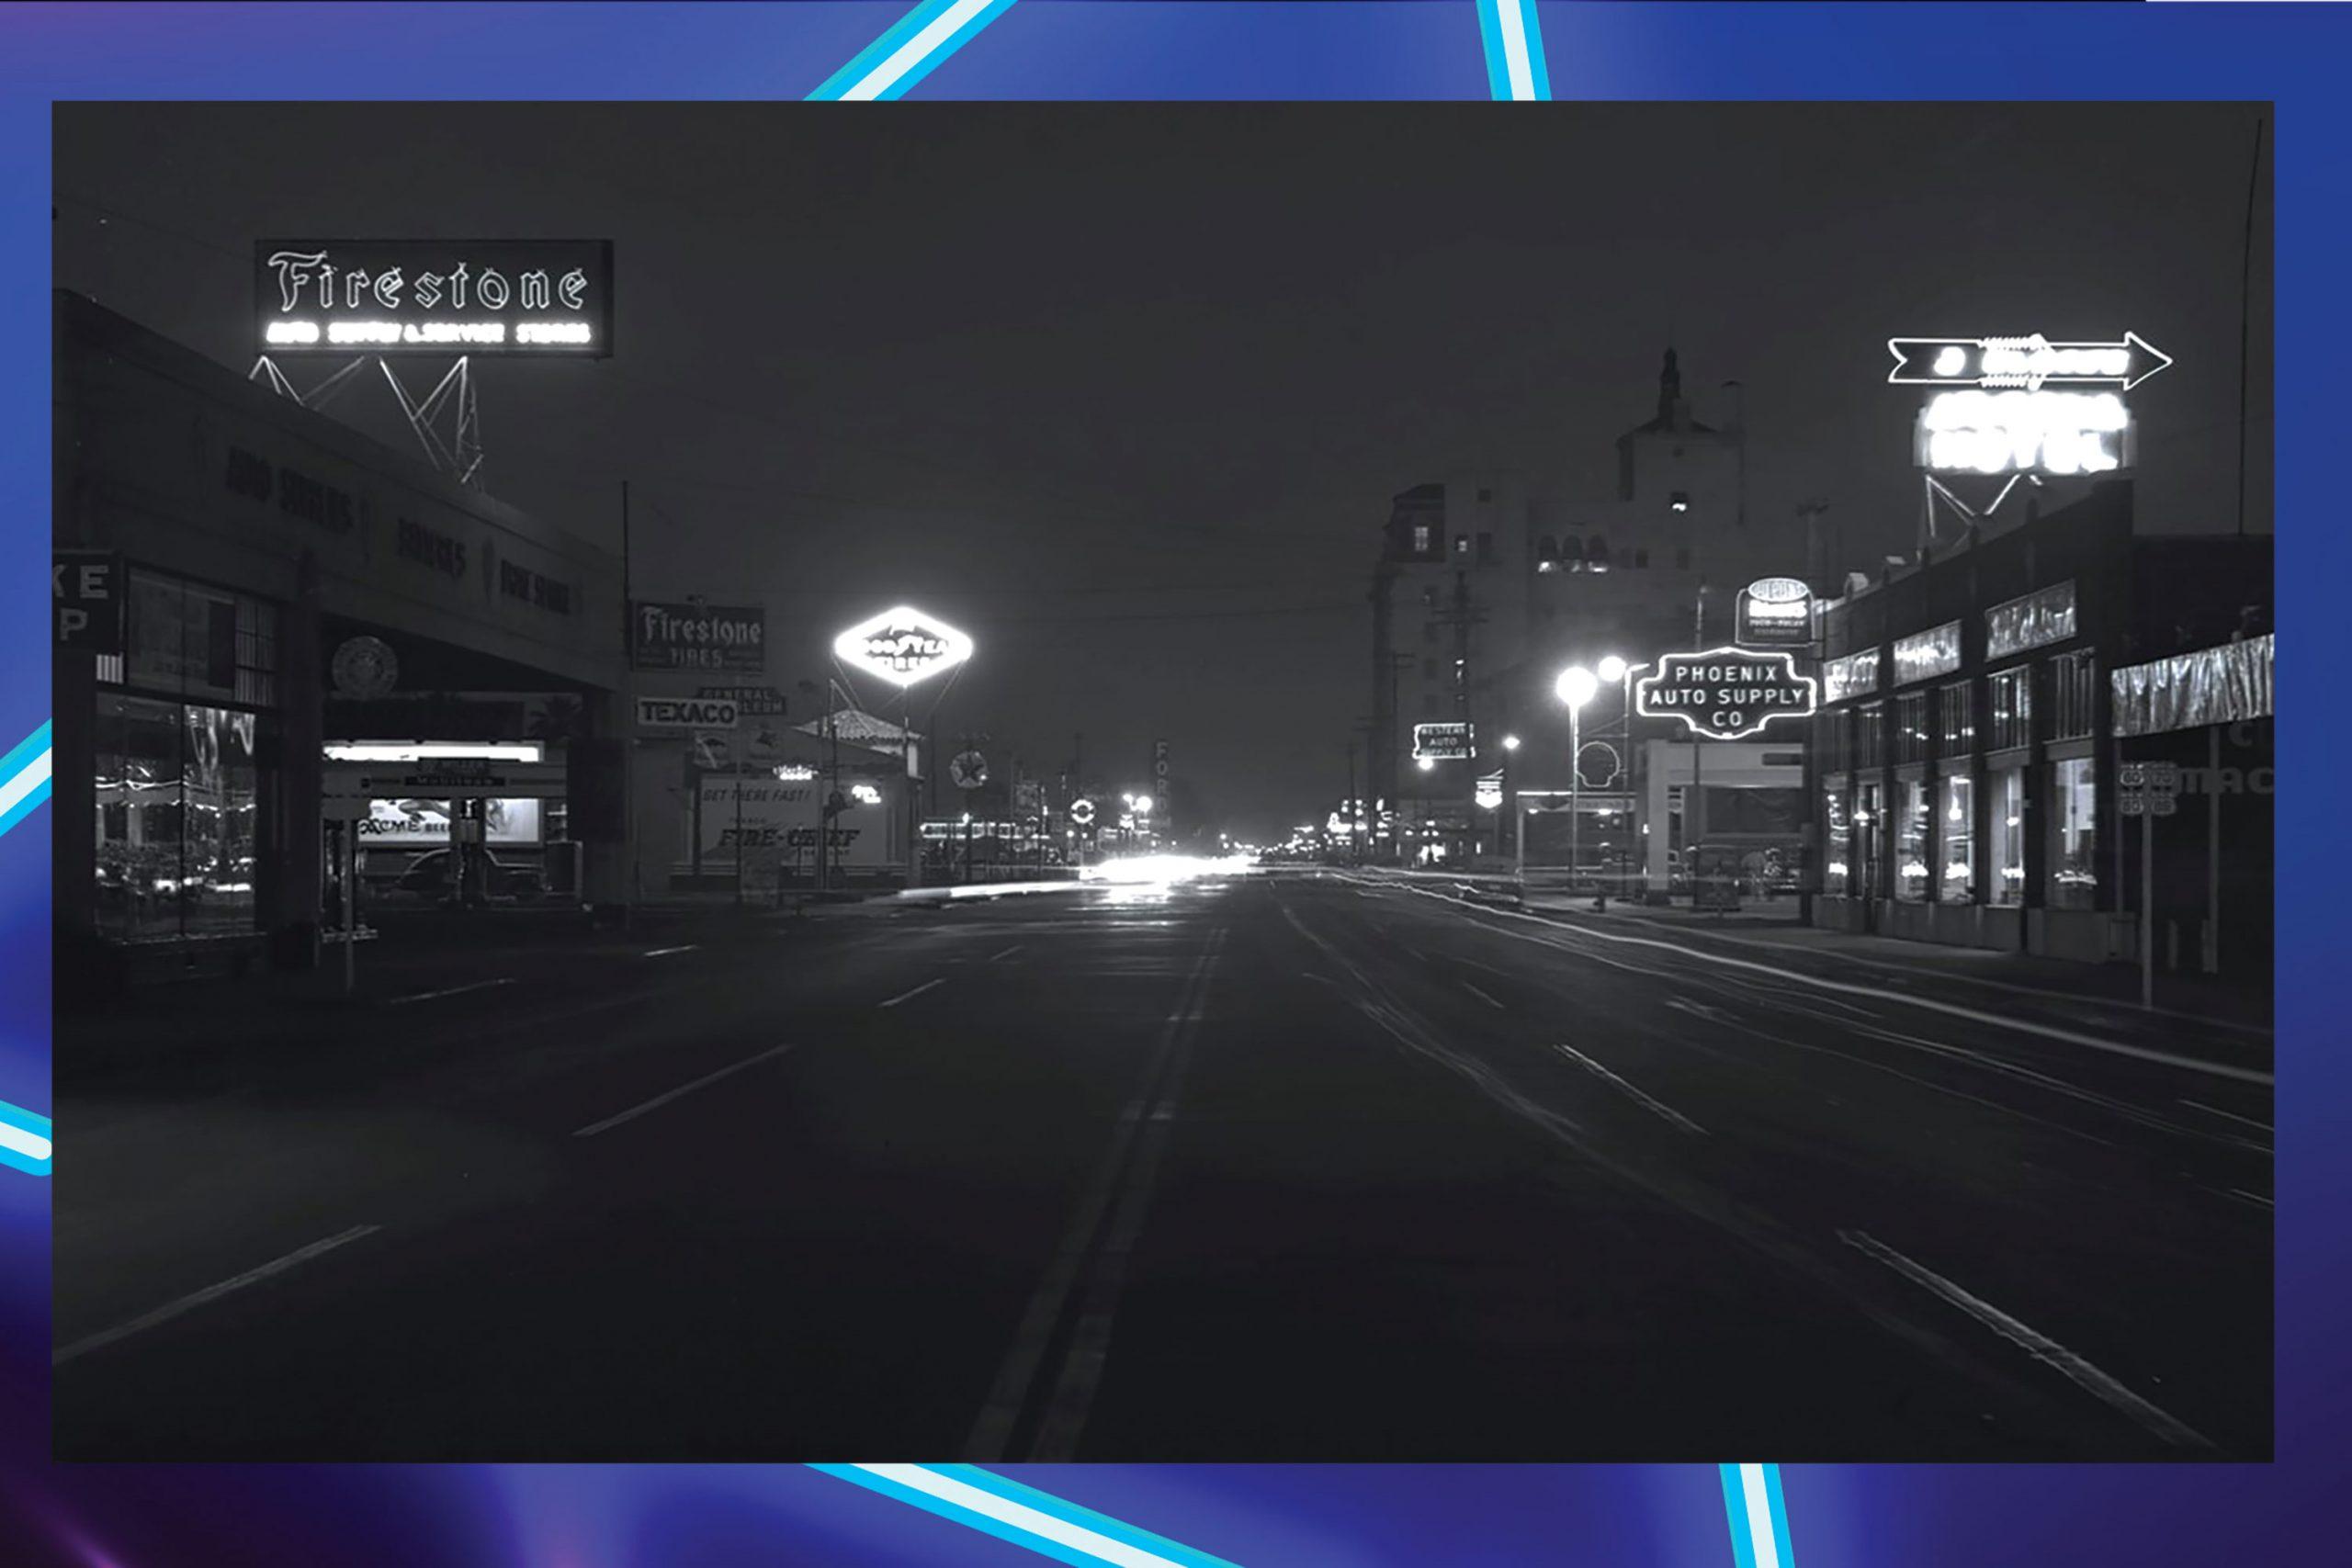 Van Buren Street looking east from Fifth Avenue, 1940s; Photo courtesy Library of Congress